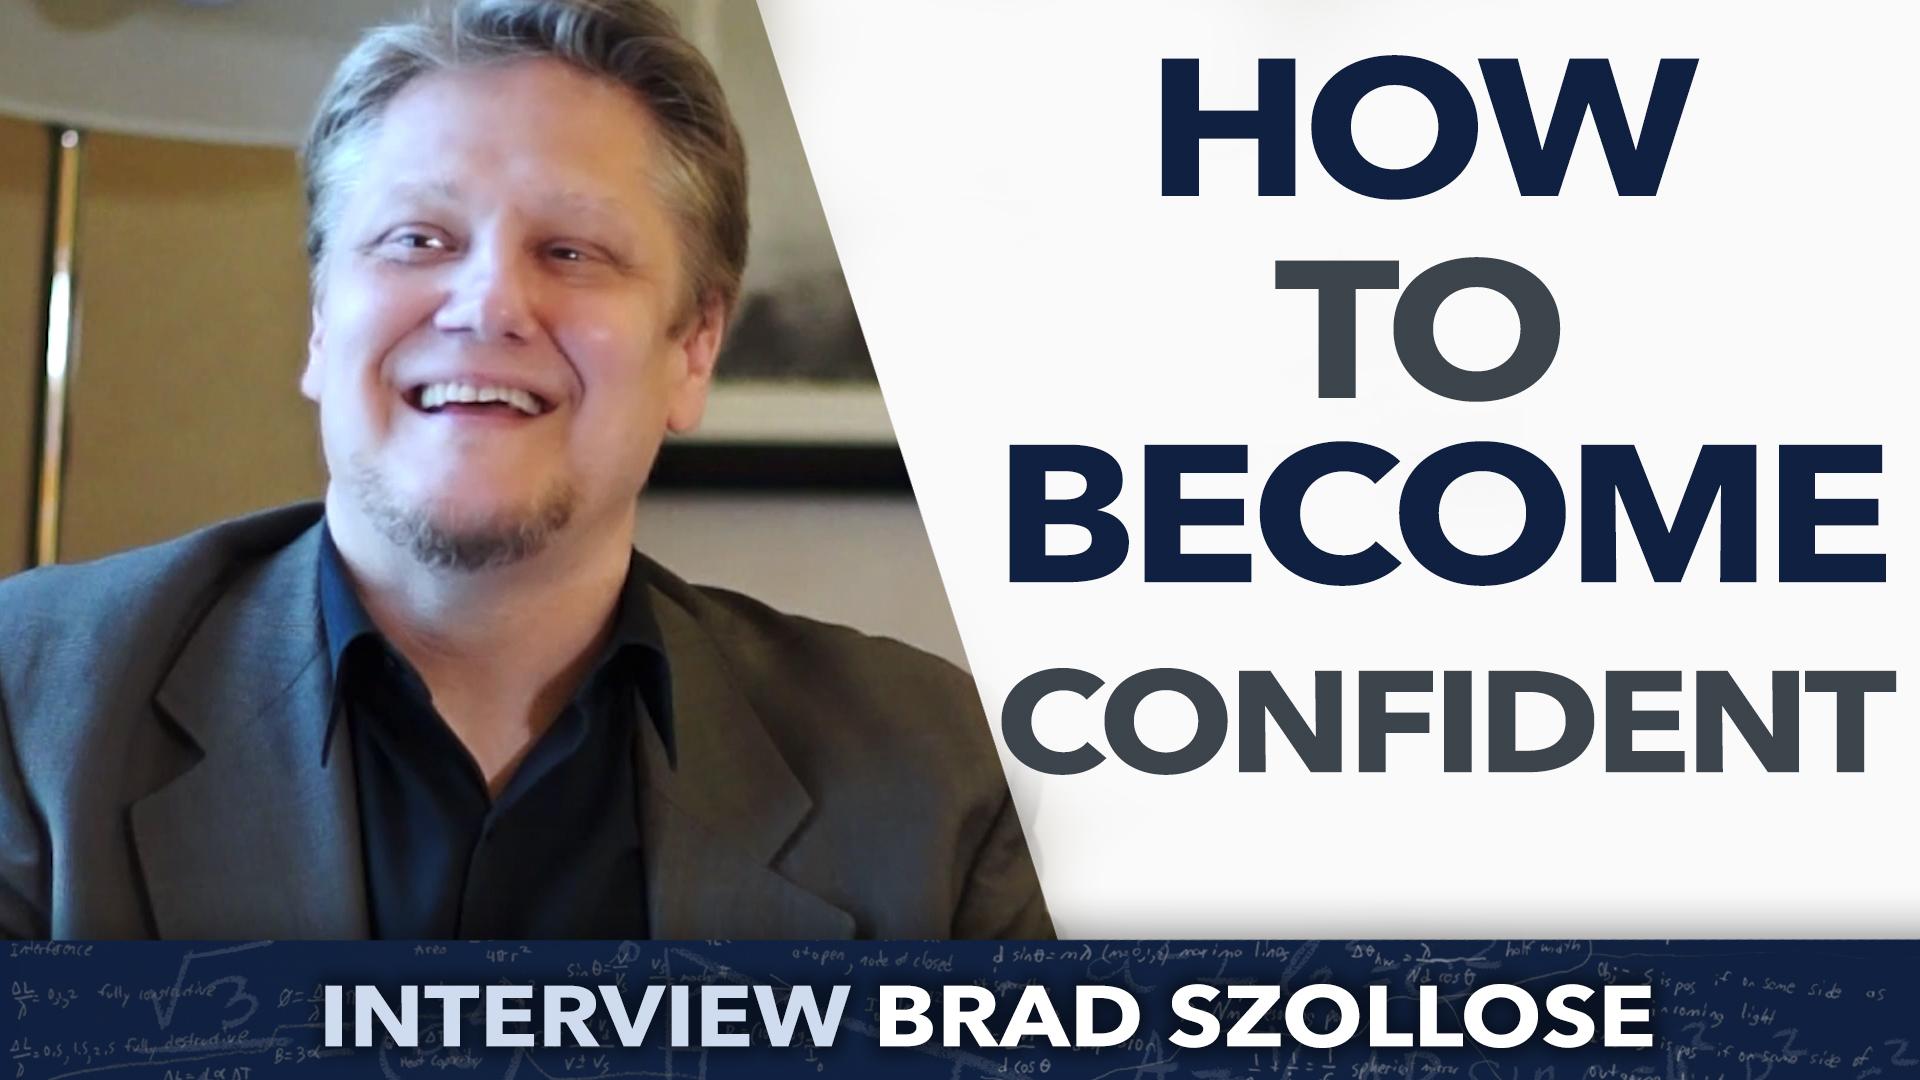 How to become confident ? – Brad Szollose